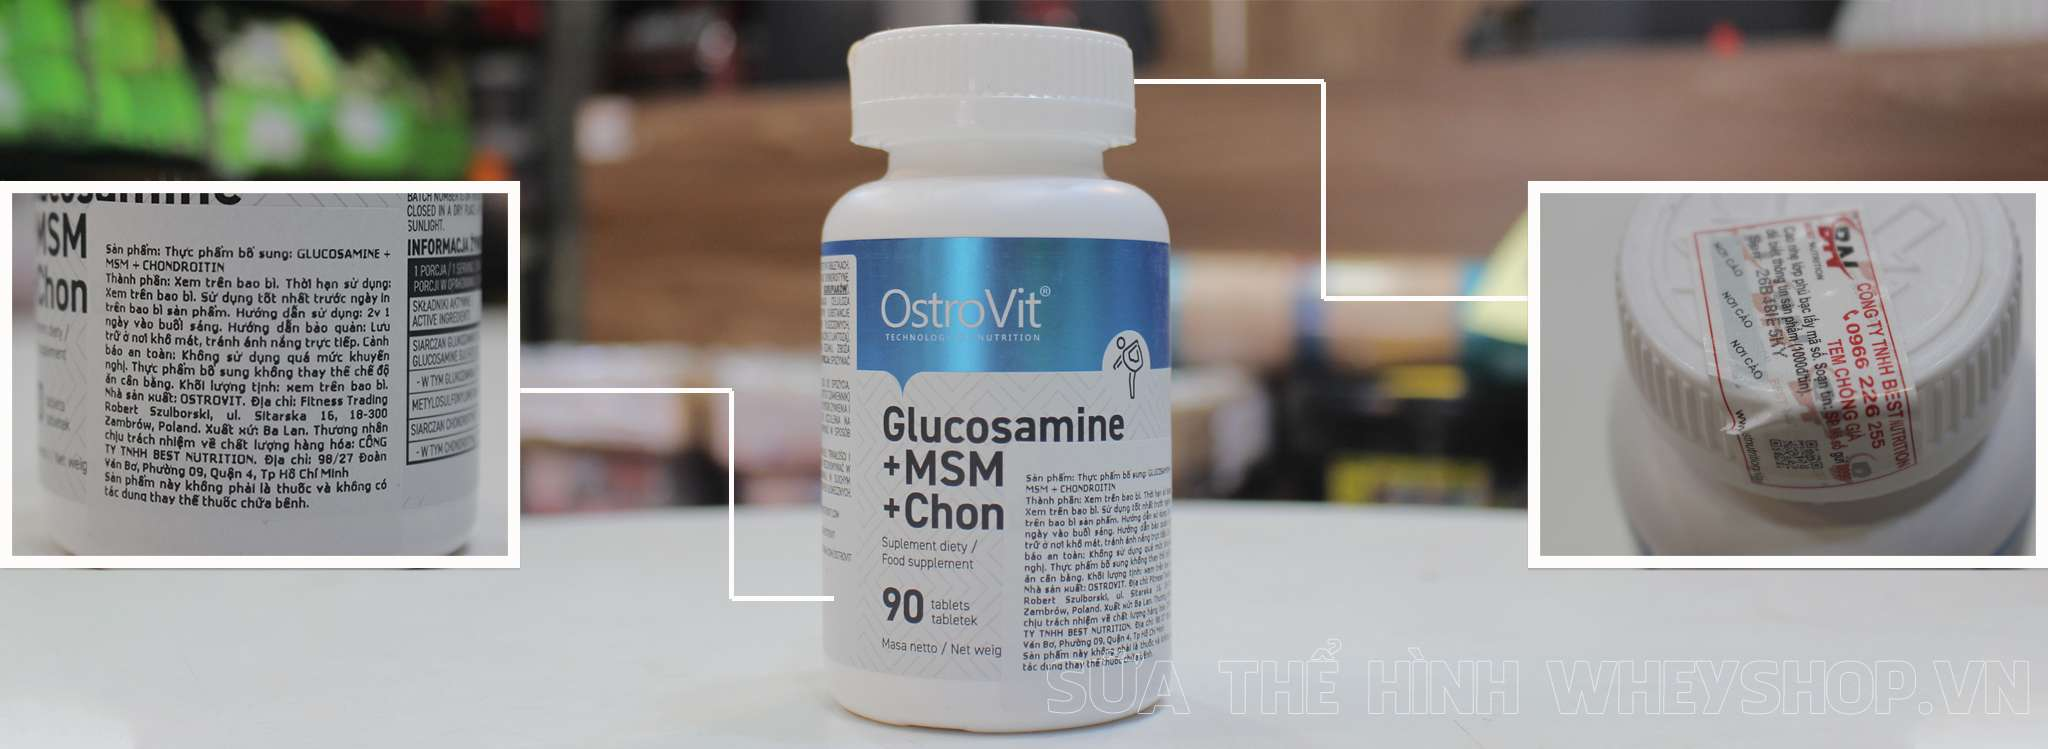 banner Ostrovit Glucosamine+MSM+Chondrotin 90 vien tem nhan hieu chinh hang tai wheyshop